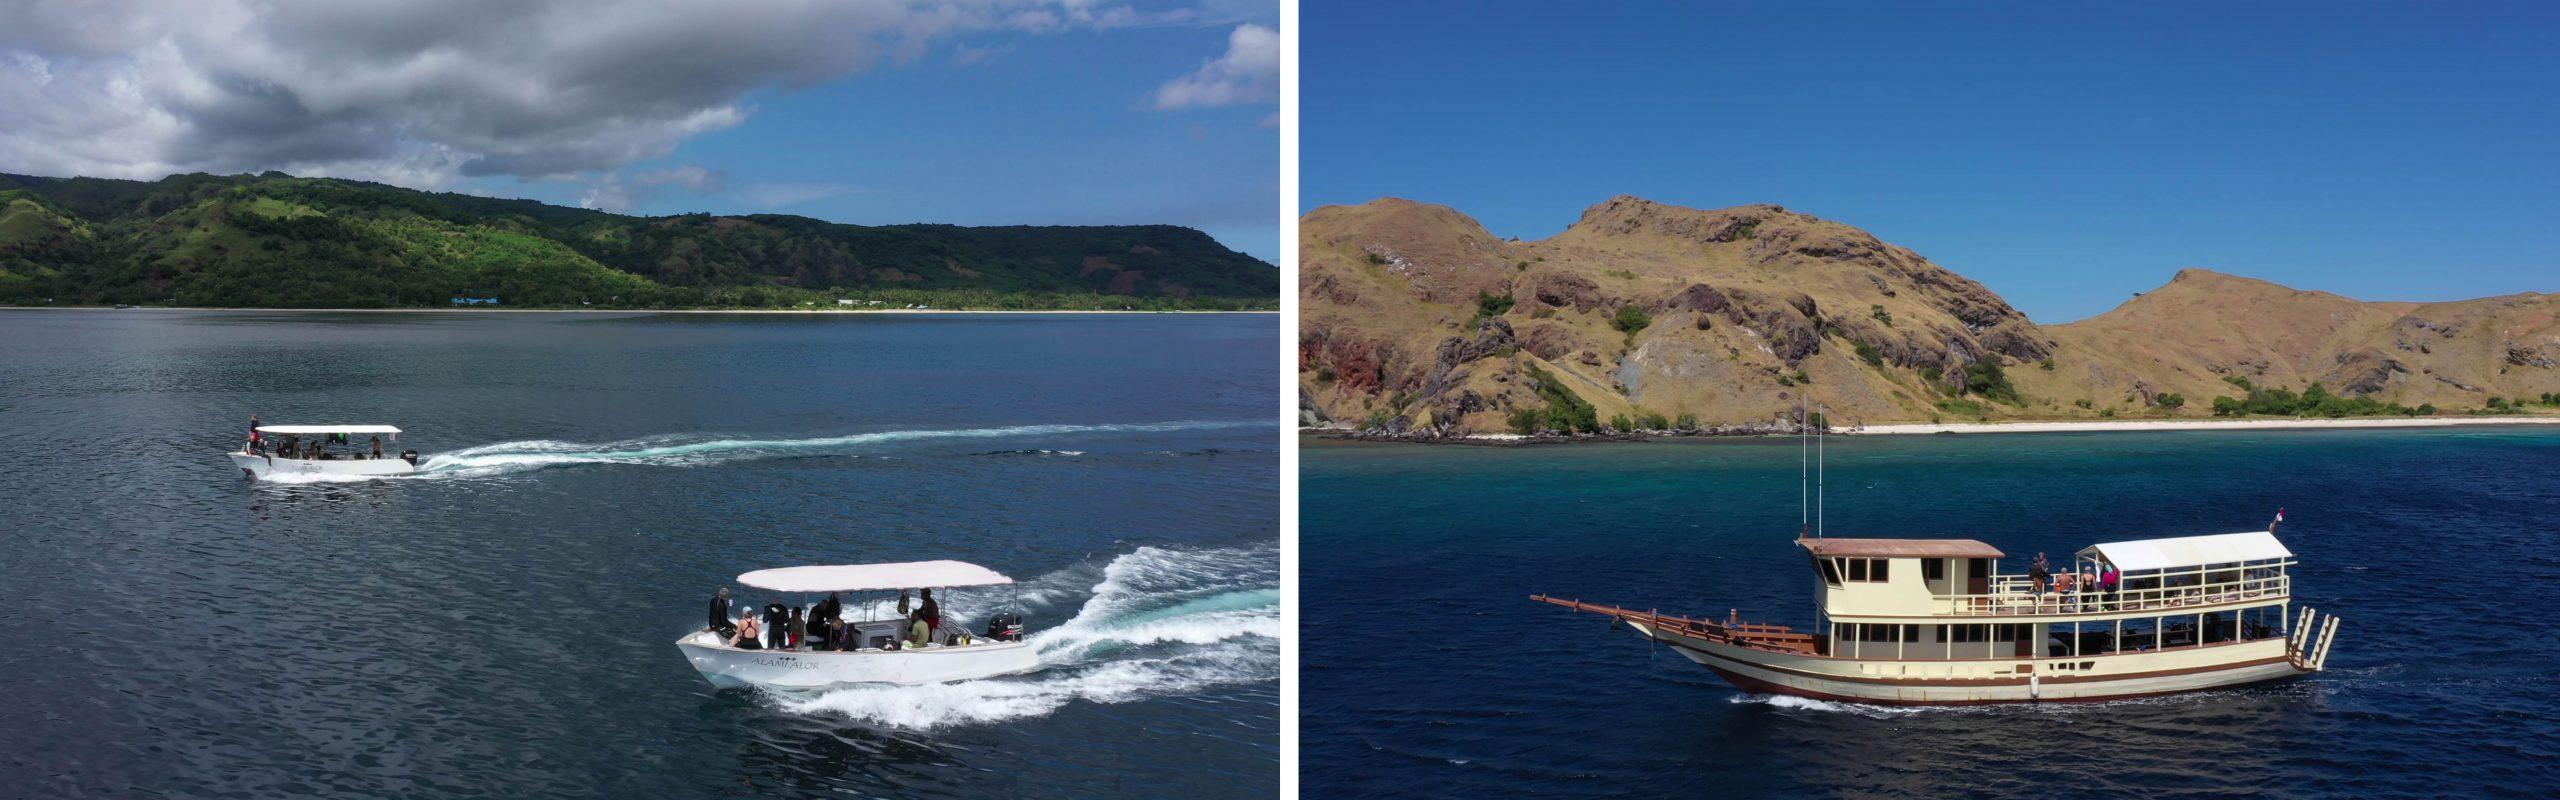 Komodo Resort and Alami Alor's snorkeling boats